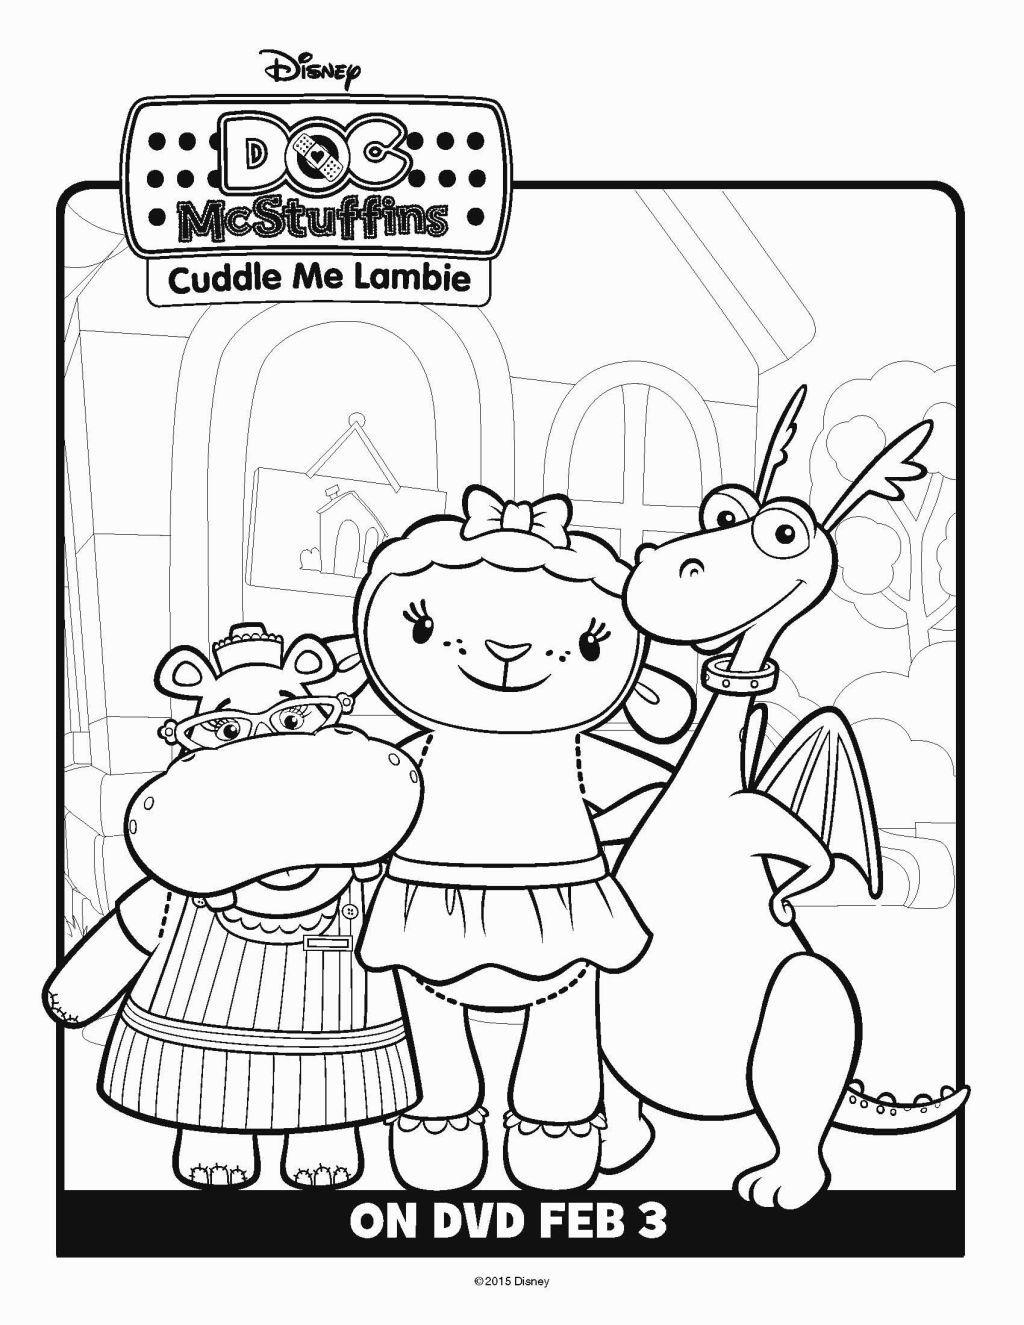 Coloring Pages Of Doc Mcstuffins | Coloring Pages | Pinterest